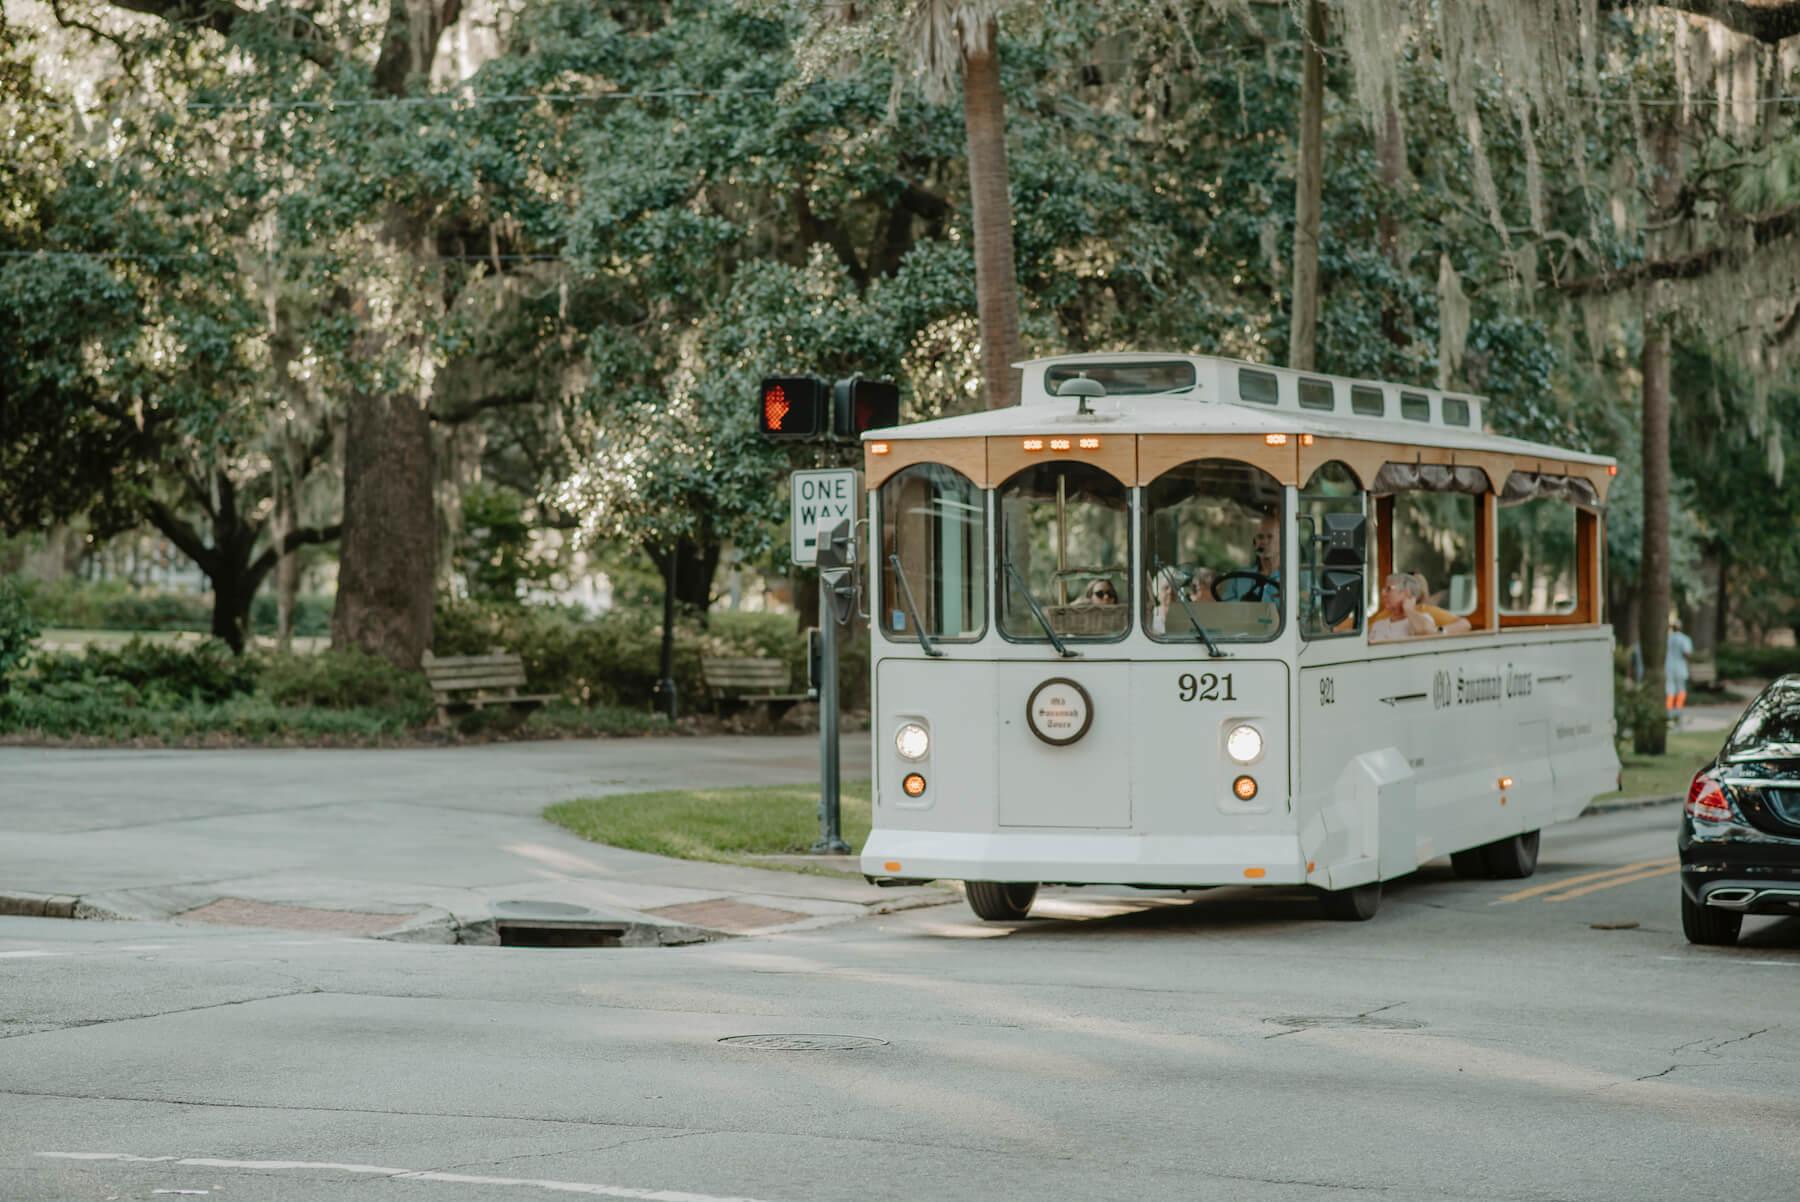 a trolley bus Savannah, Georgia, United States of America